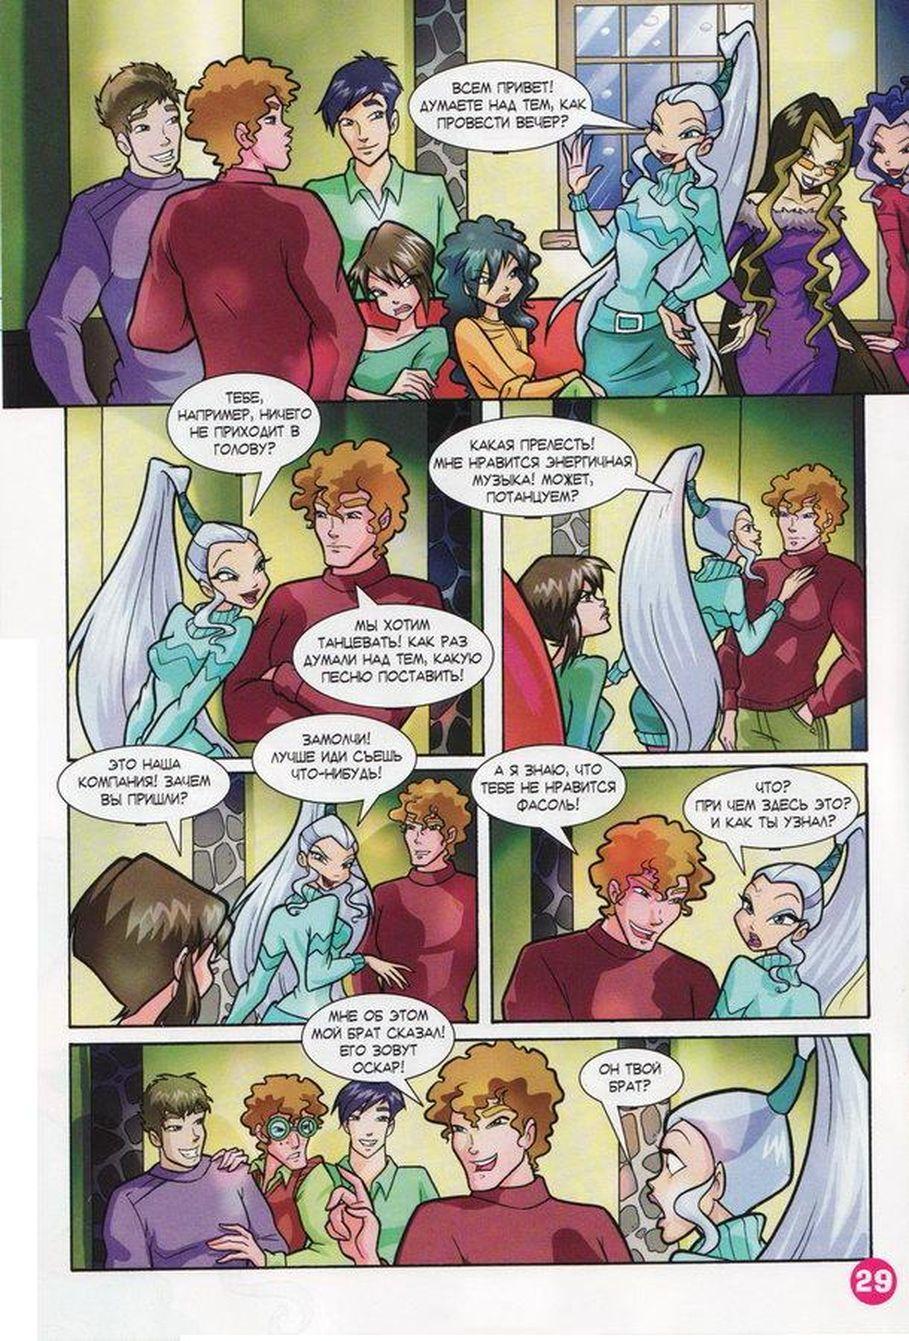 Комикс Винкс Winx - Каникулы Winx! (Журнал Винкс №10 2010)